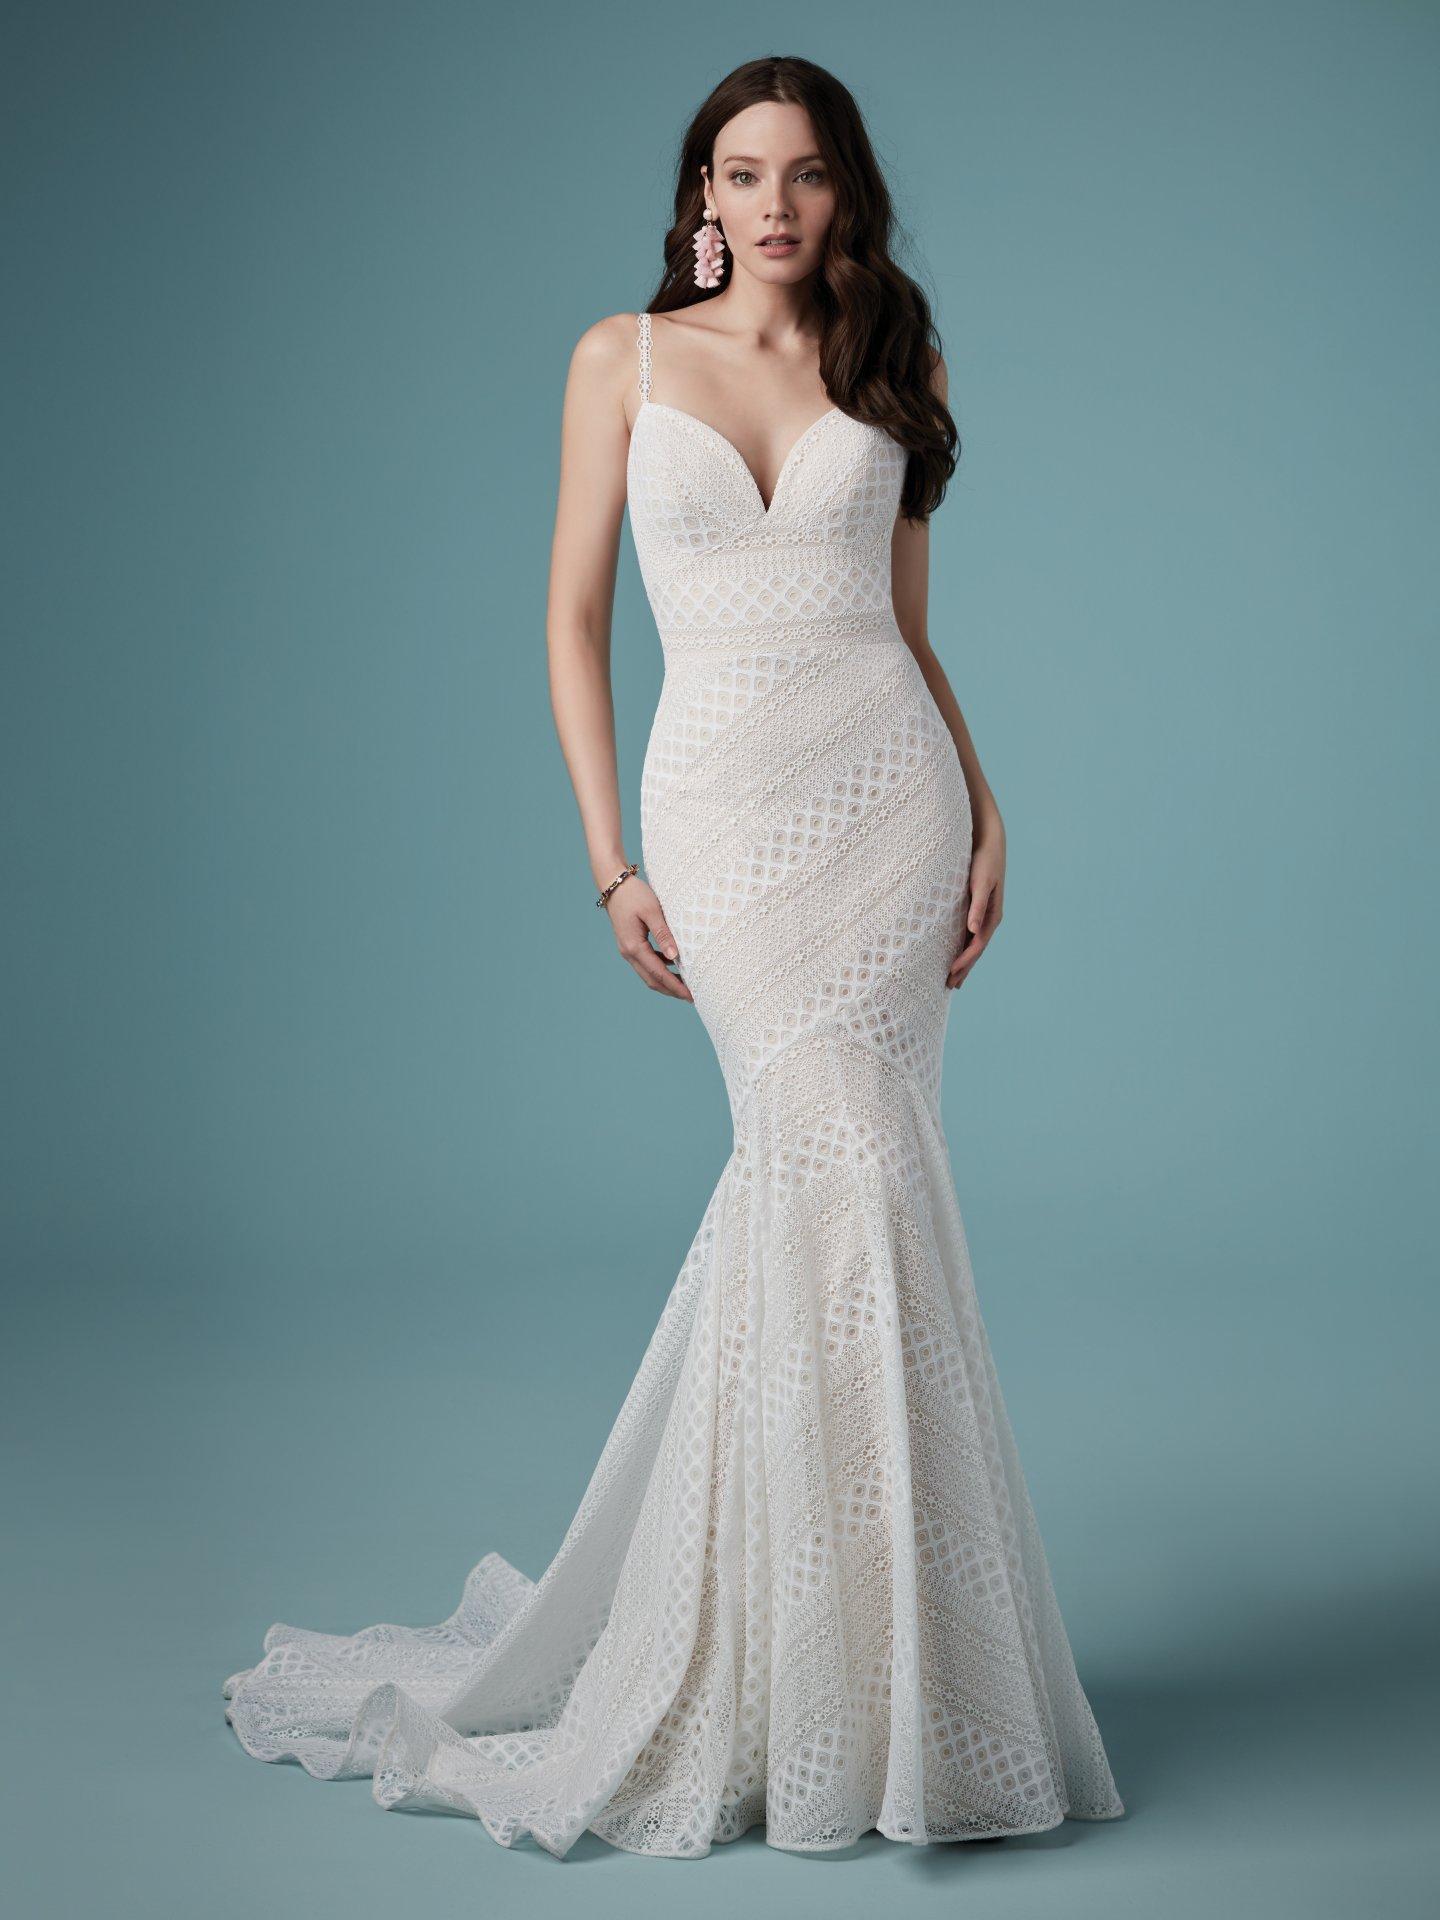 Maggie Sottero Lilana bohemian lace wedding dress bodice